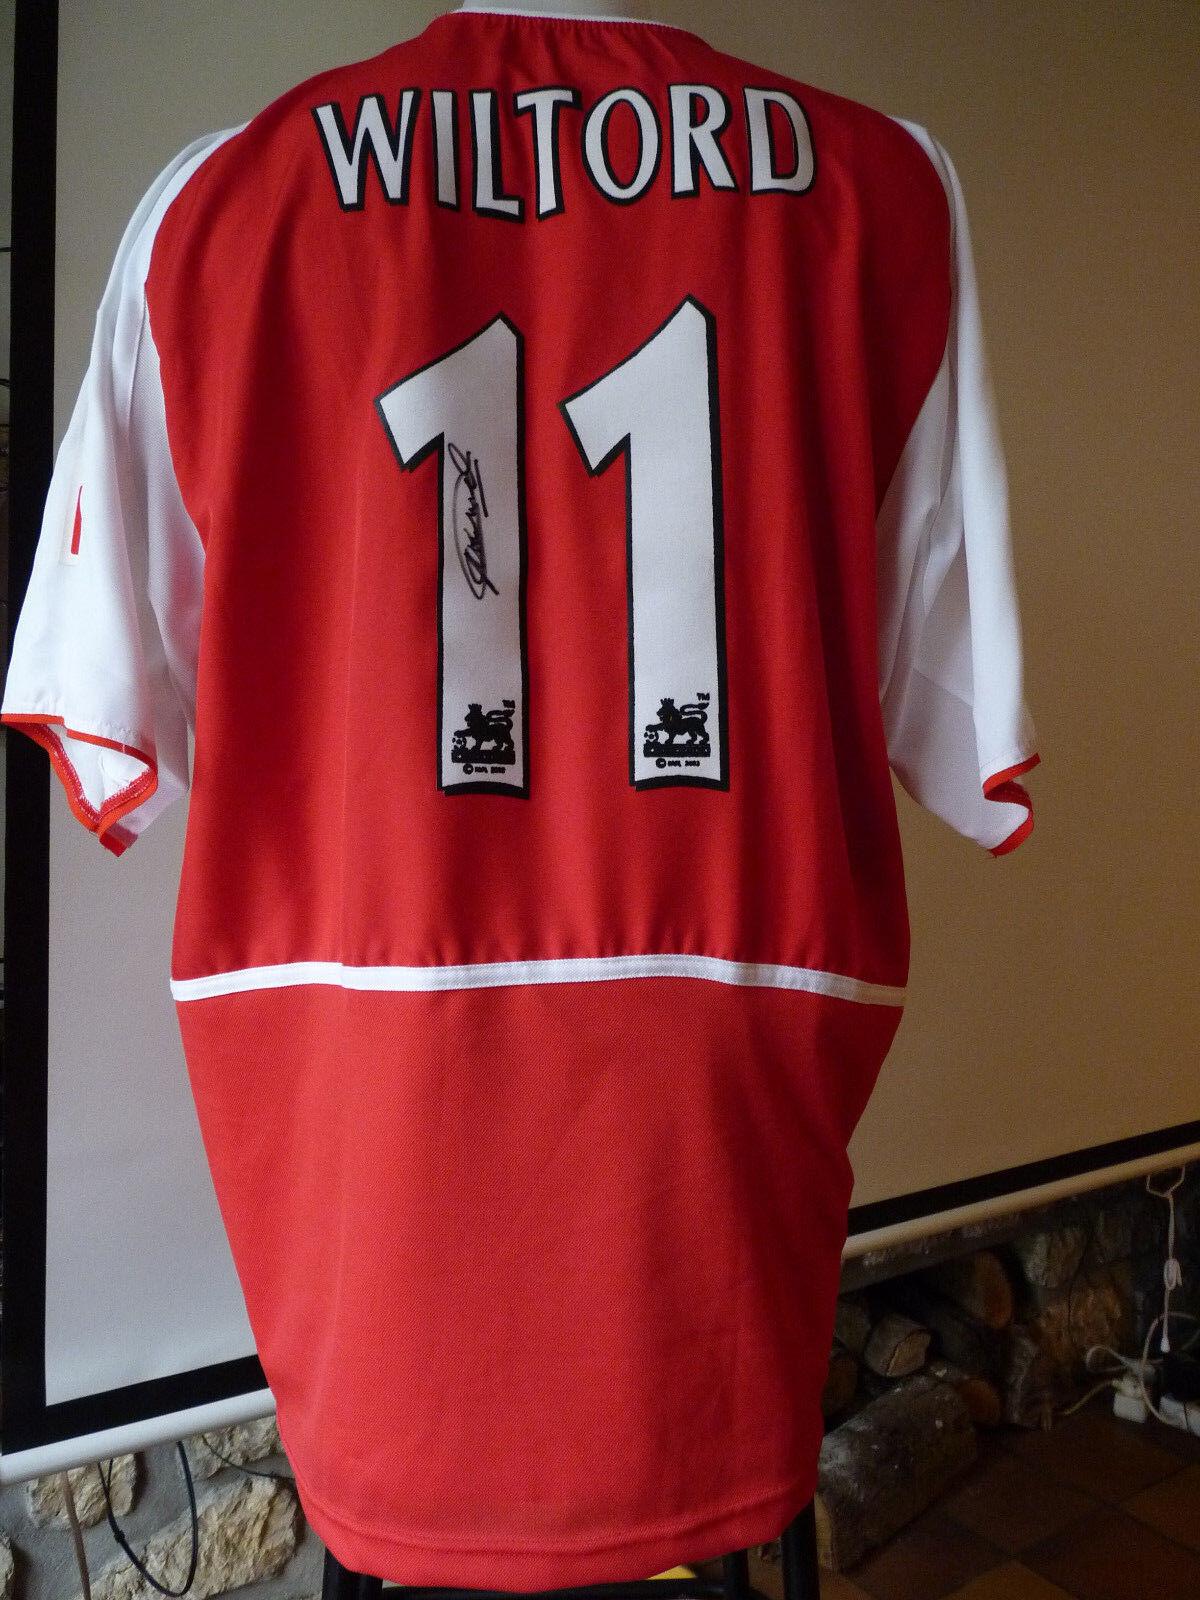 Maillot Arsenal Wiltord 20022003 0203 shirt jersey Bordeaux Lyon Rennes France